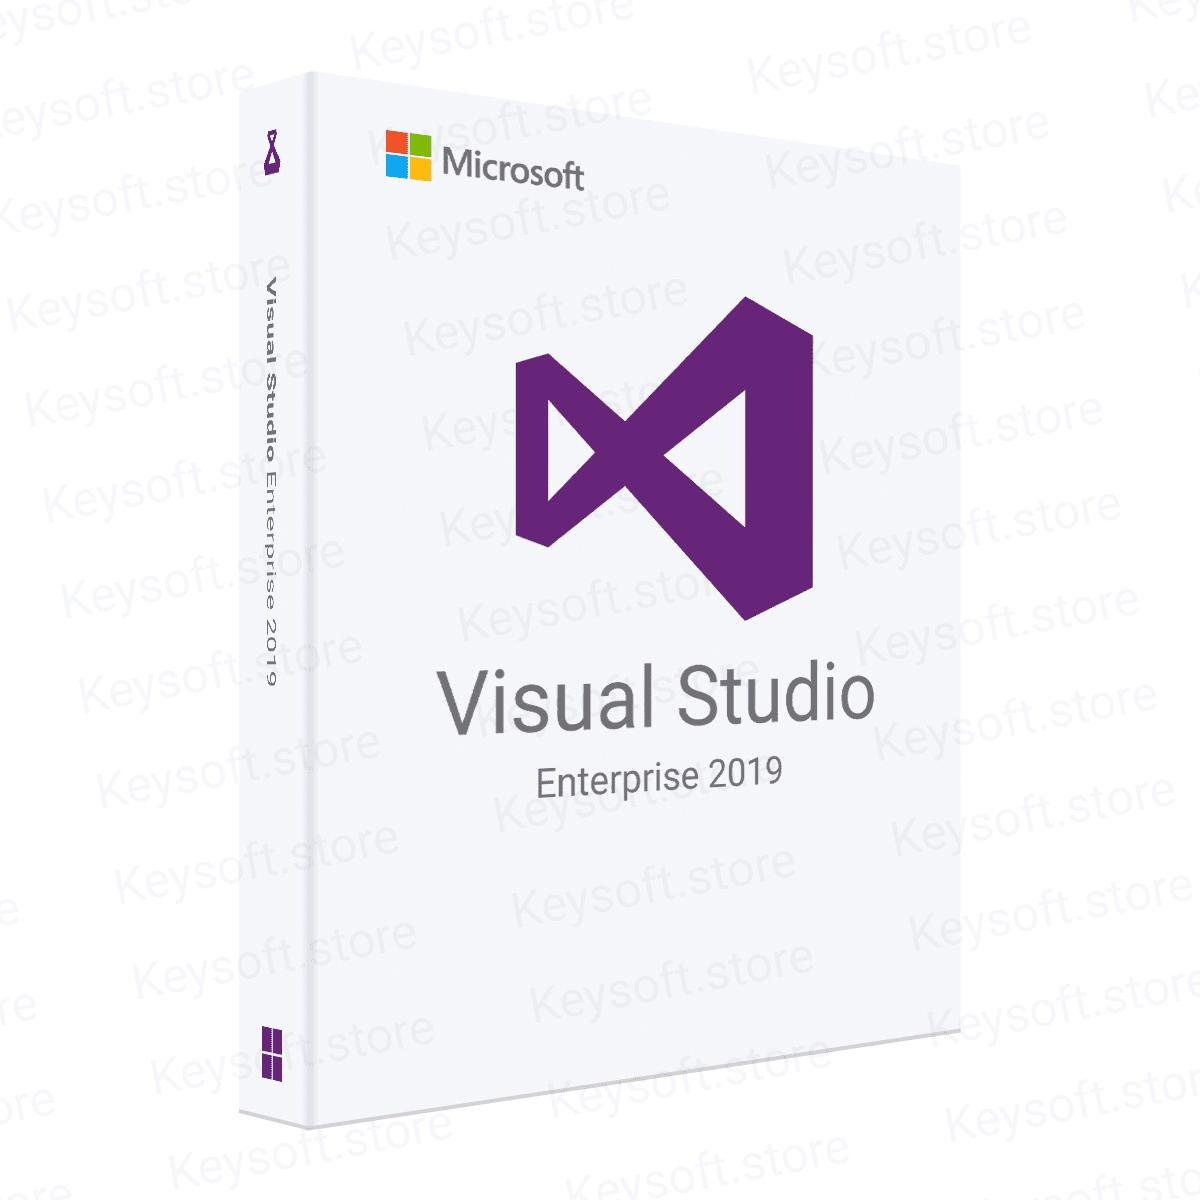 Visual Studio Enterprise 2019